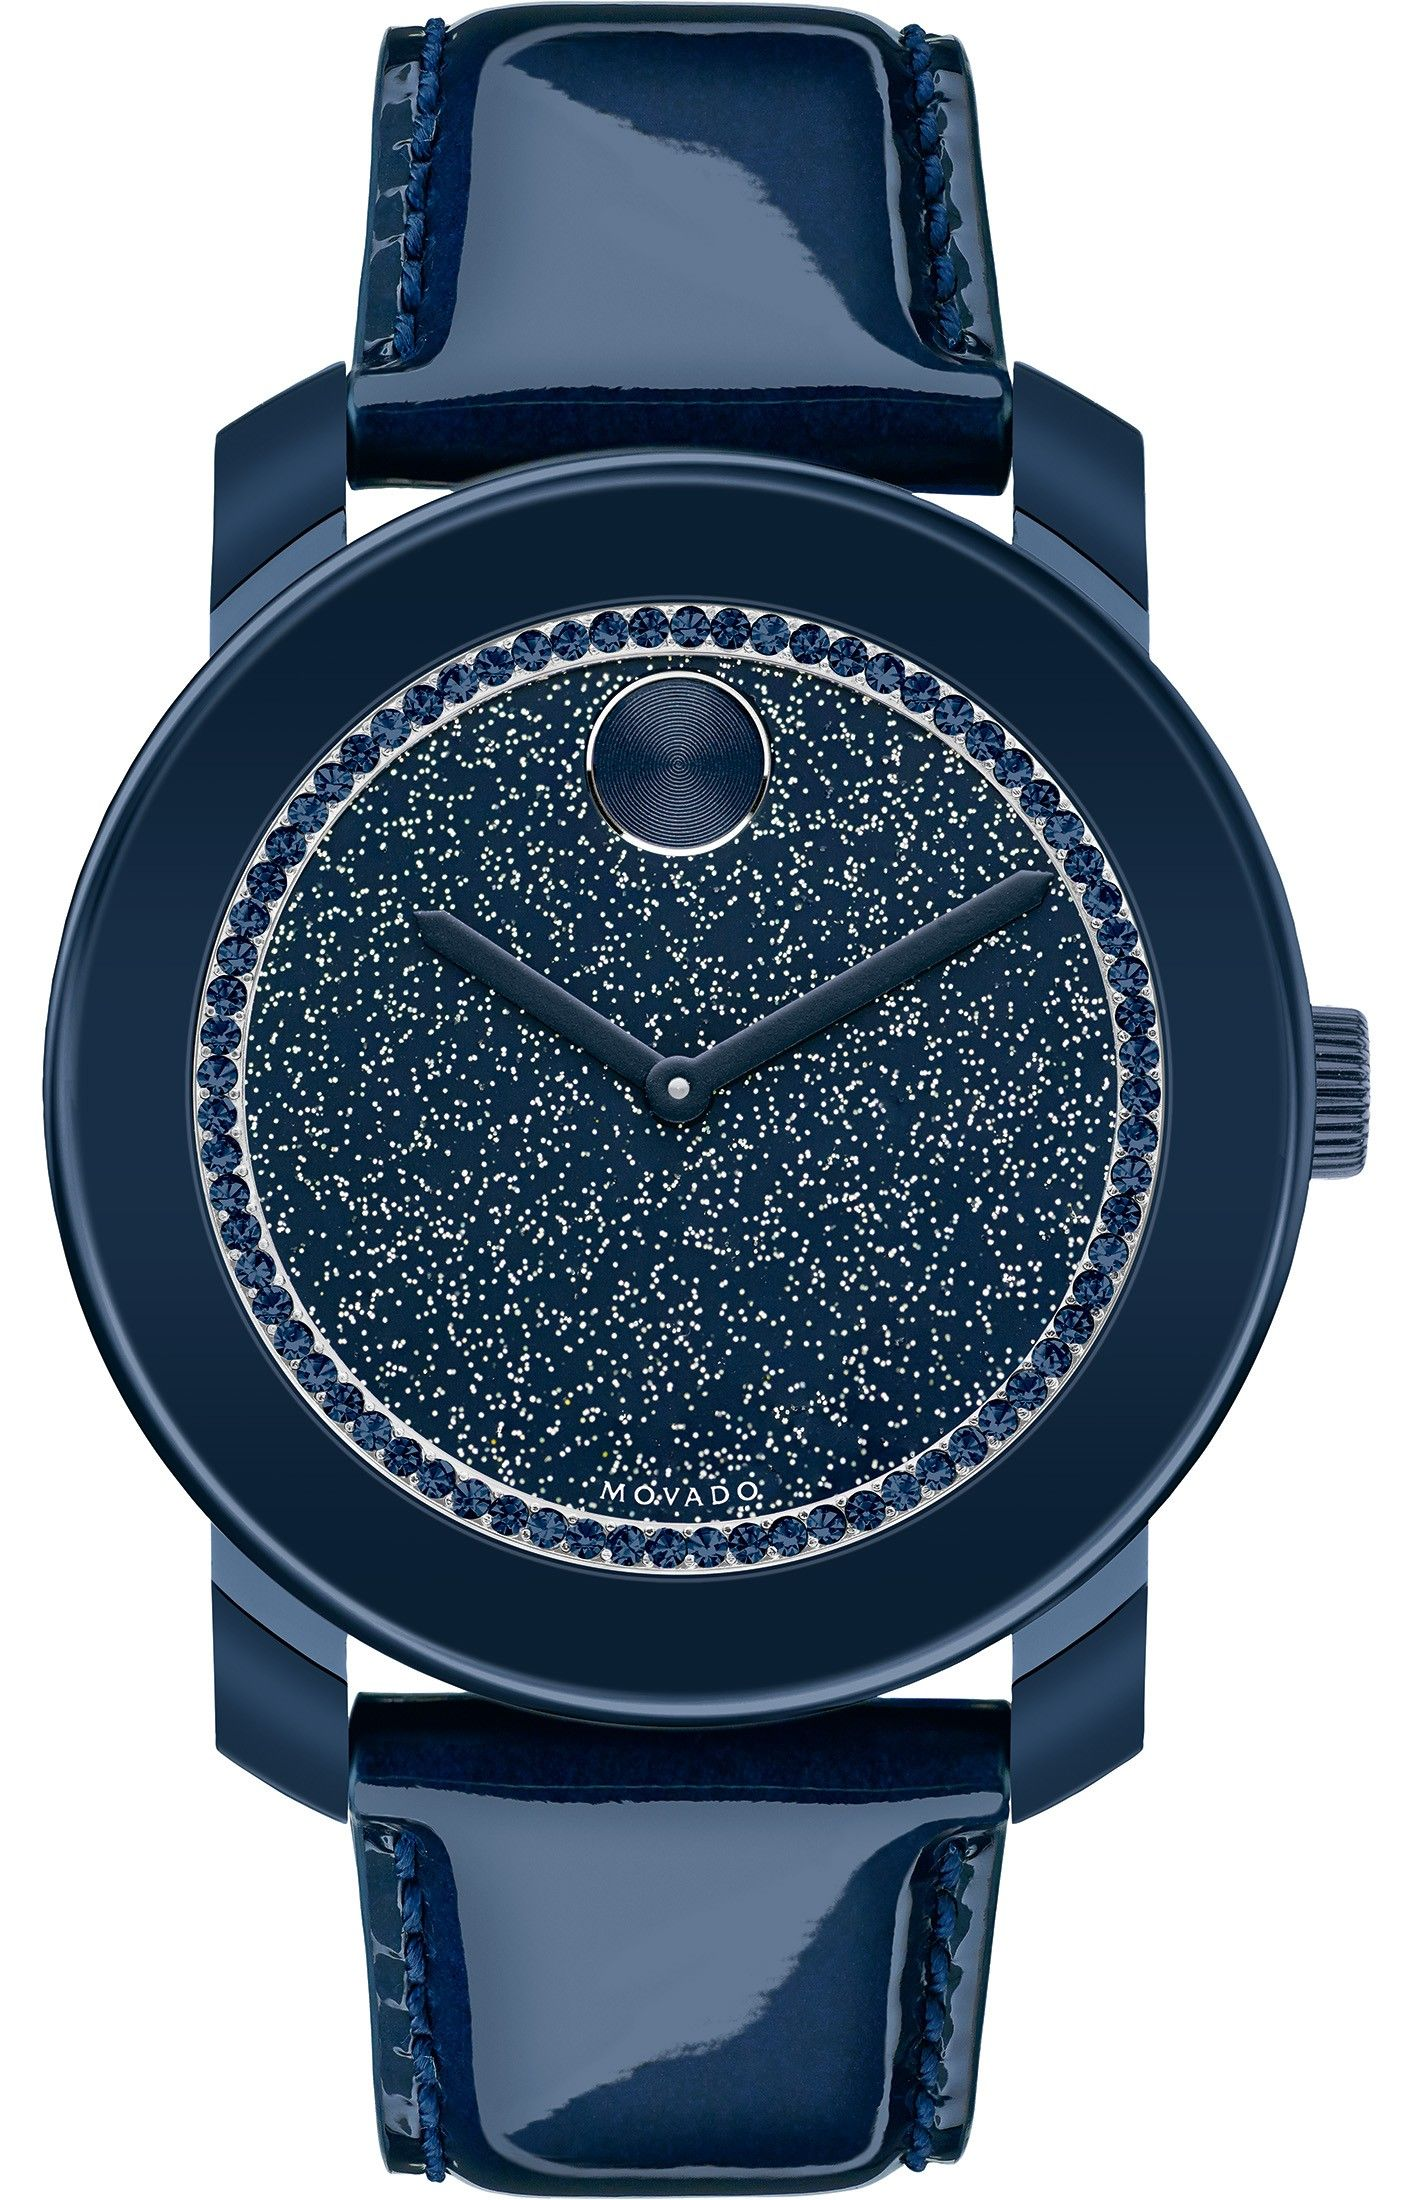 Movado Black//Aluminum Crystal Clock